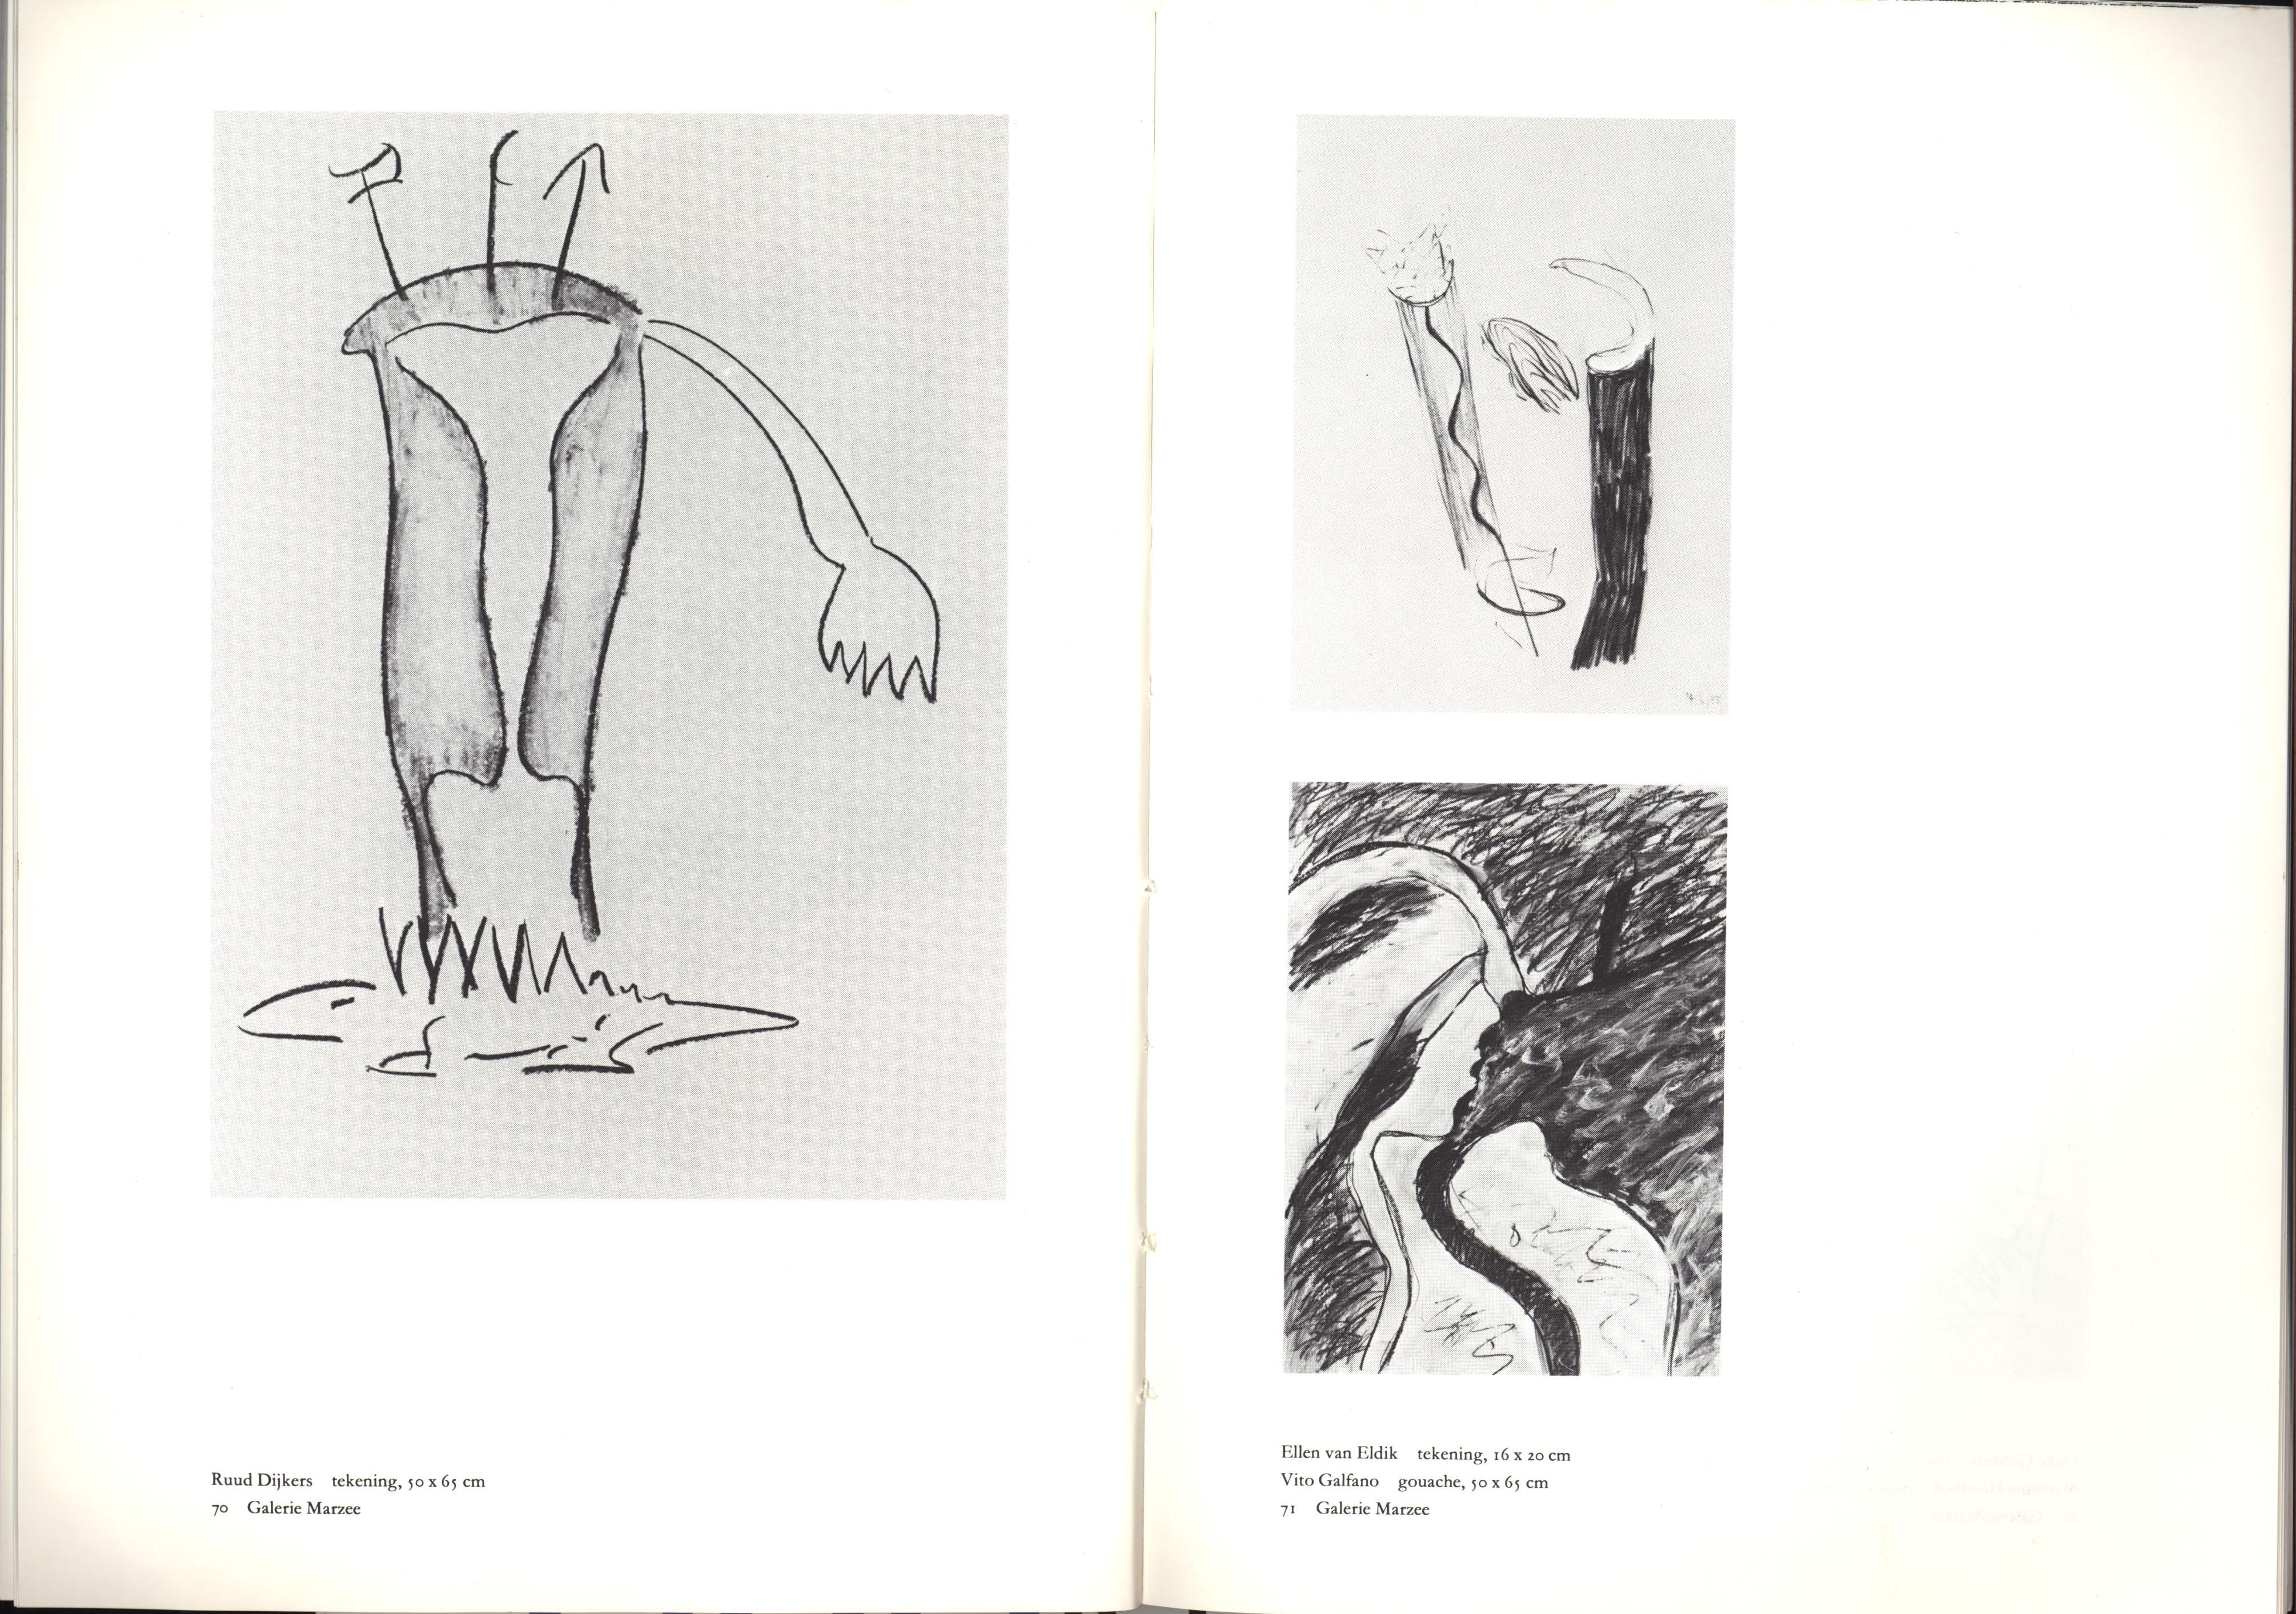 Galerie Marzee, papier, drukwerk